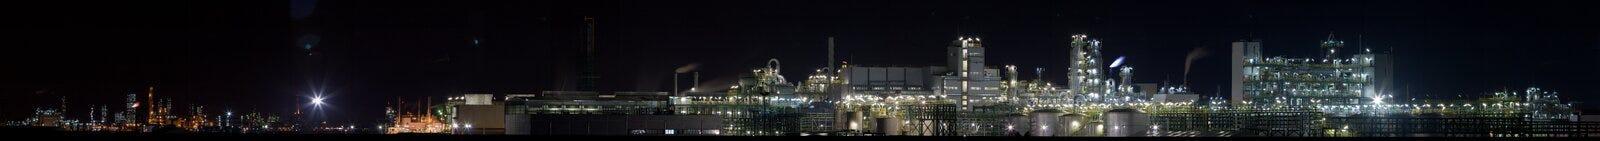 Chemische installatie in nightï¼ Panorama 3) royalty-vrije stock foto's